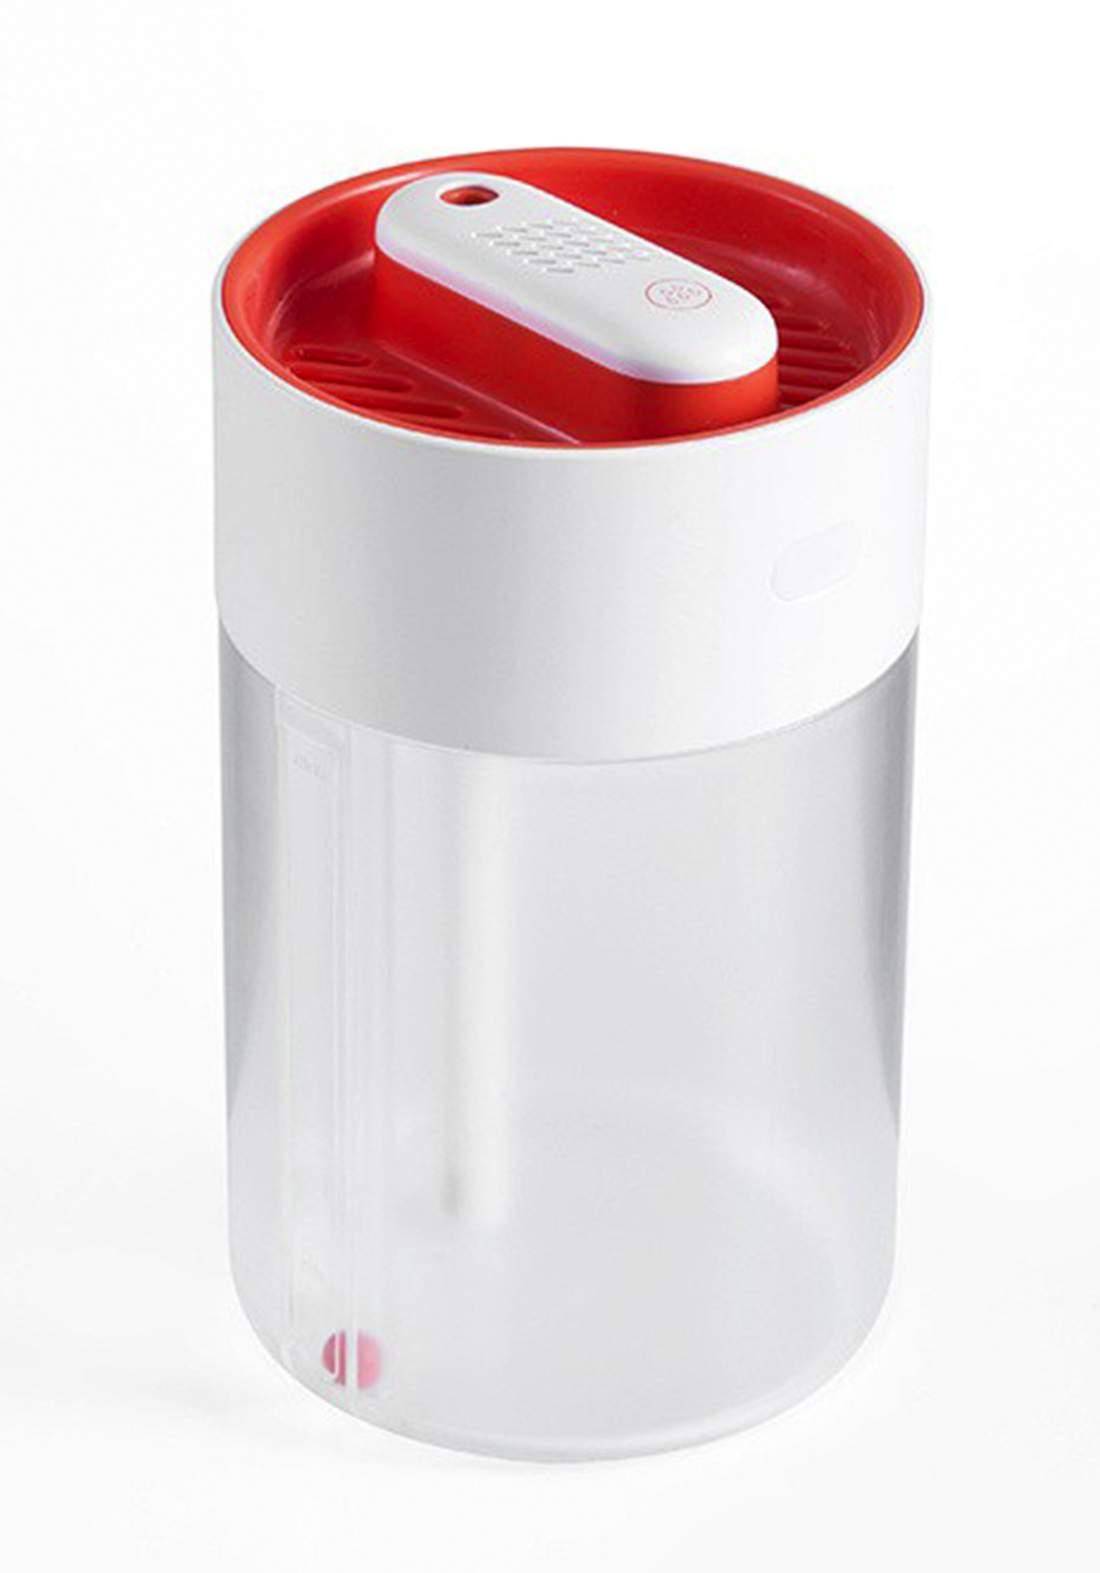 Remax RL-HM15 Suyun Series Upper Water Air Purifier Aroma Essential Oil Diffuser مبخرة معطرة